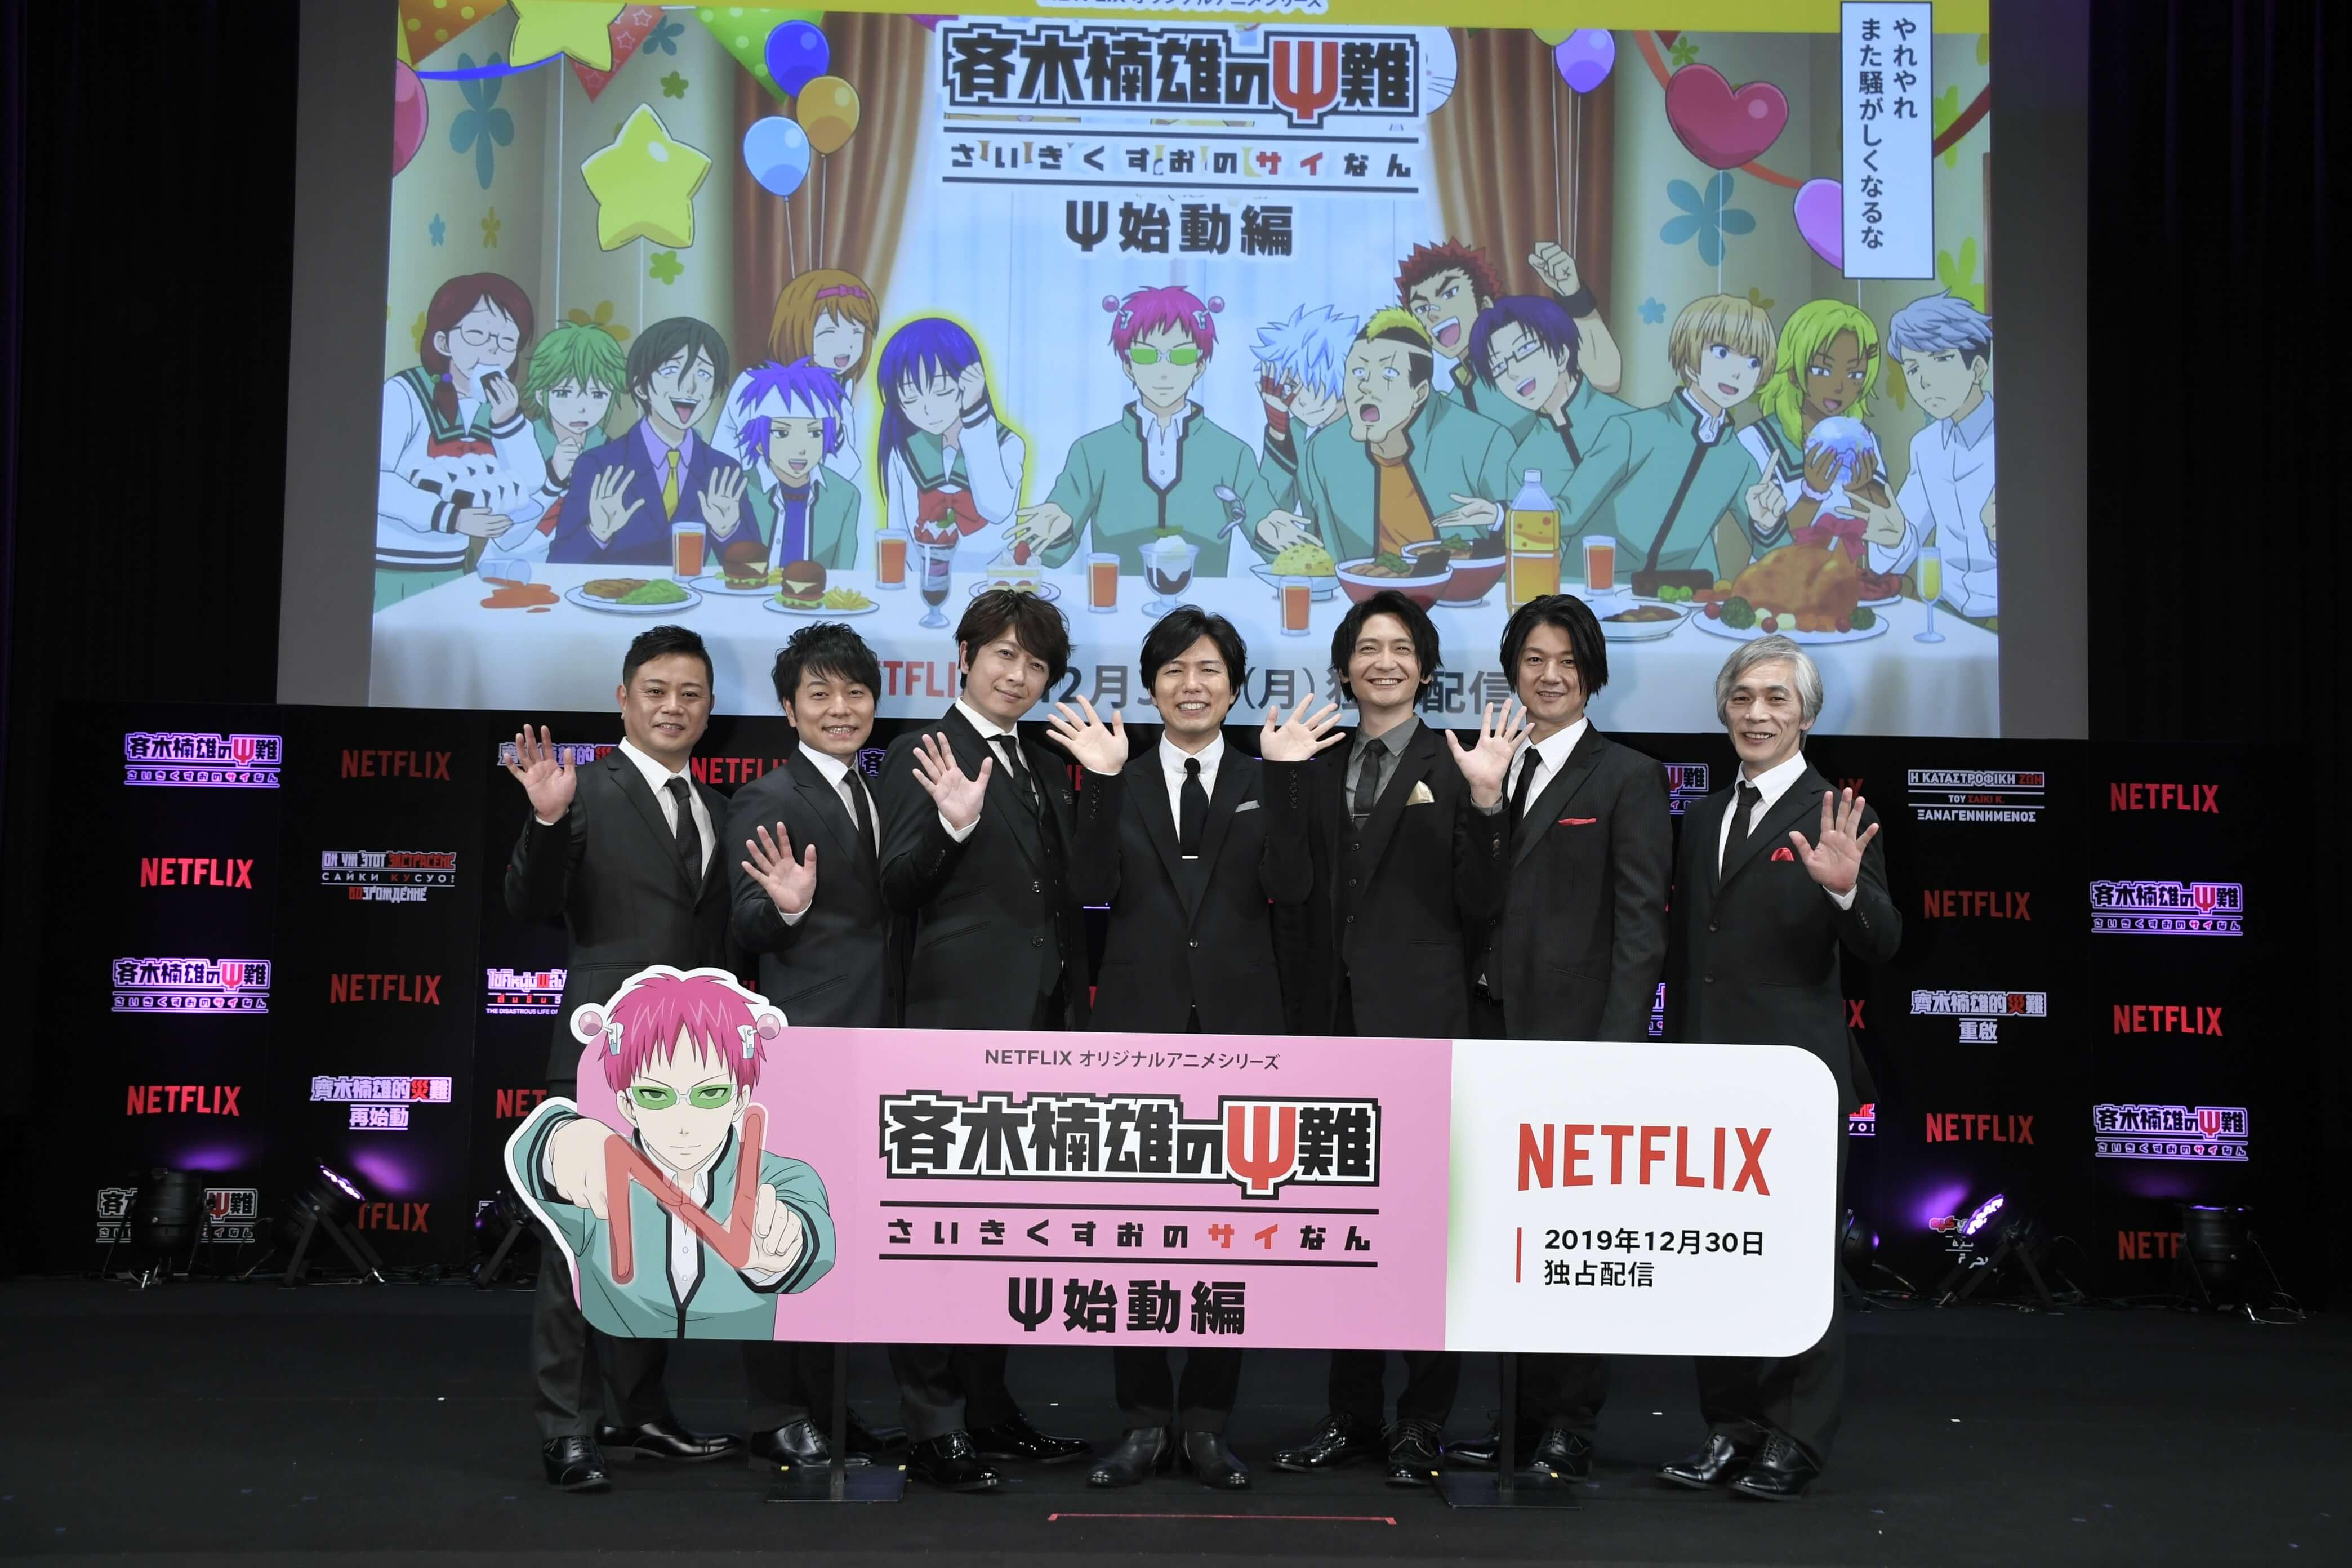 斉木楠雄のΨ難 Ψ始動編 The Disastrous Life of Saiki K. 齊木楠雄的災難 Netflix